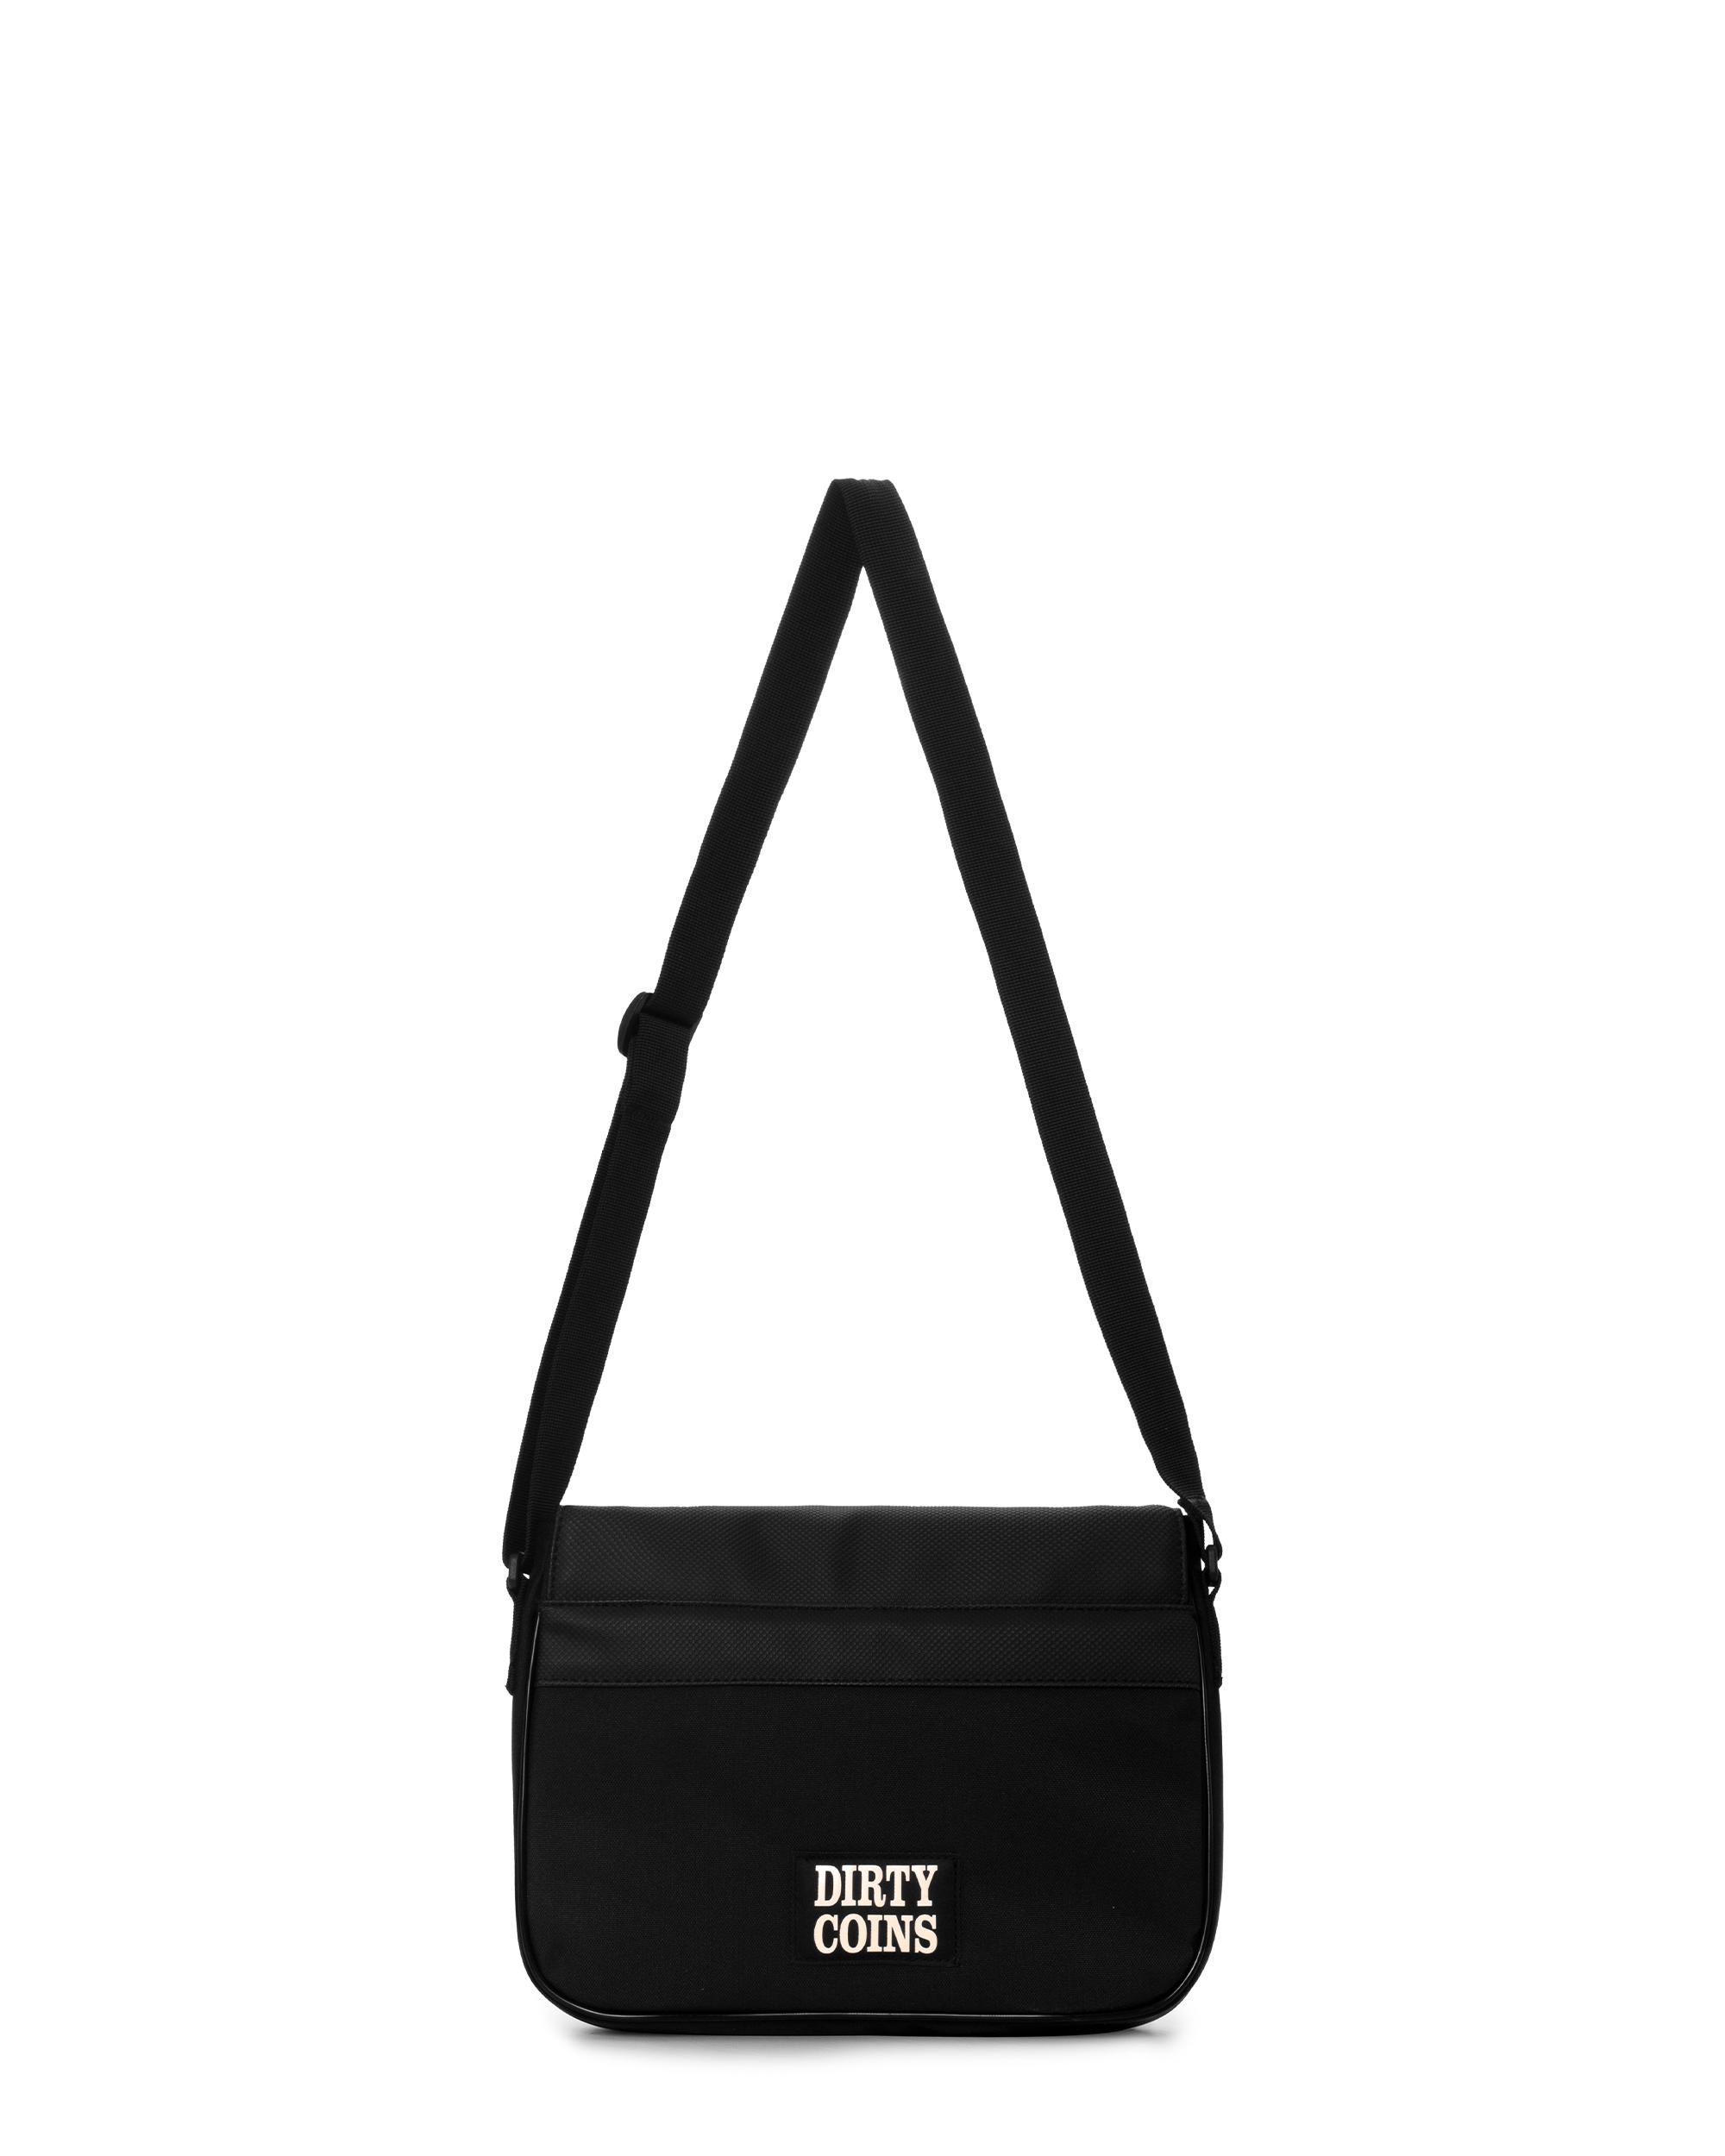 DirtyCoins Y Basic T-Shirt  - Earth Pink